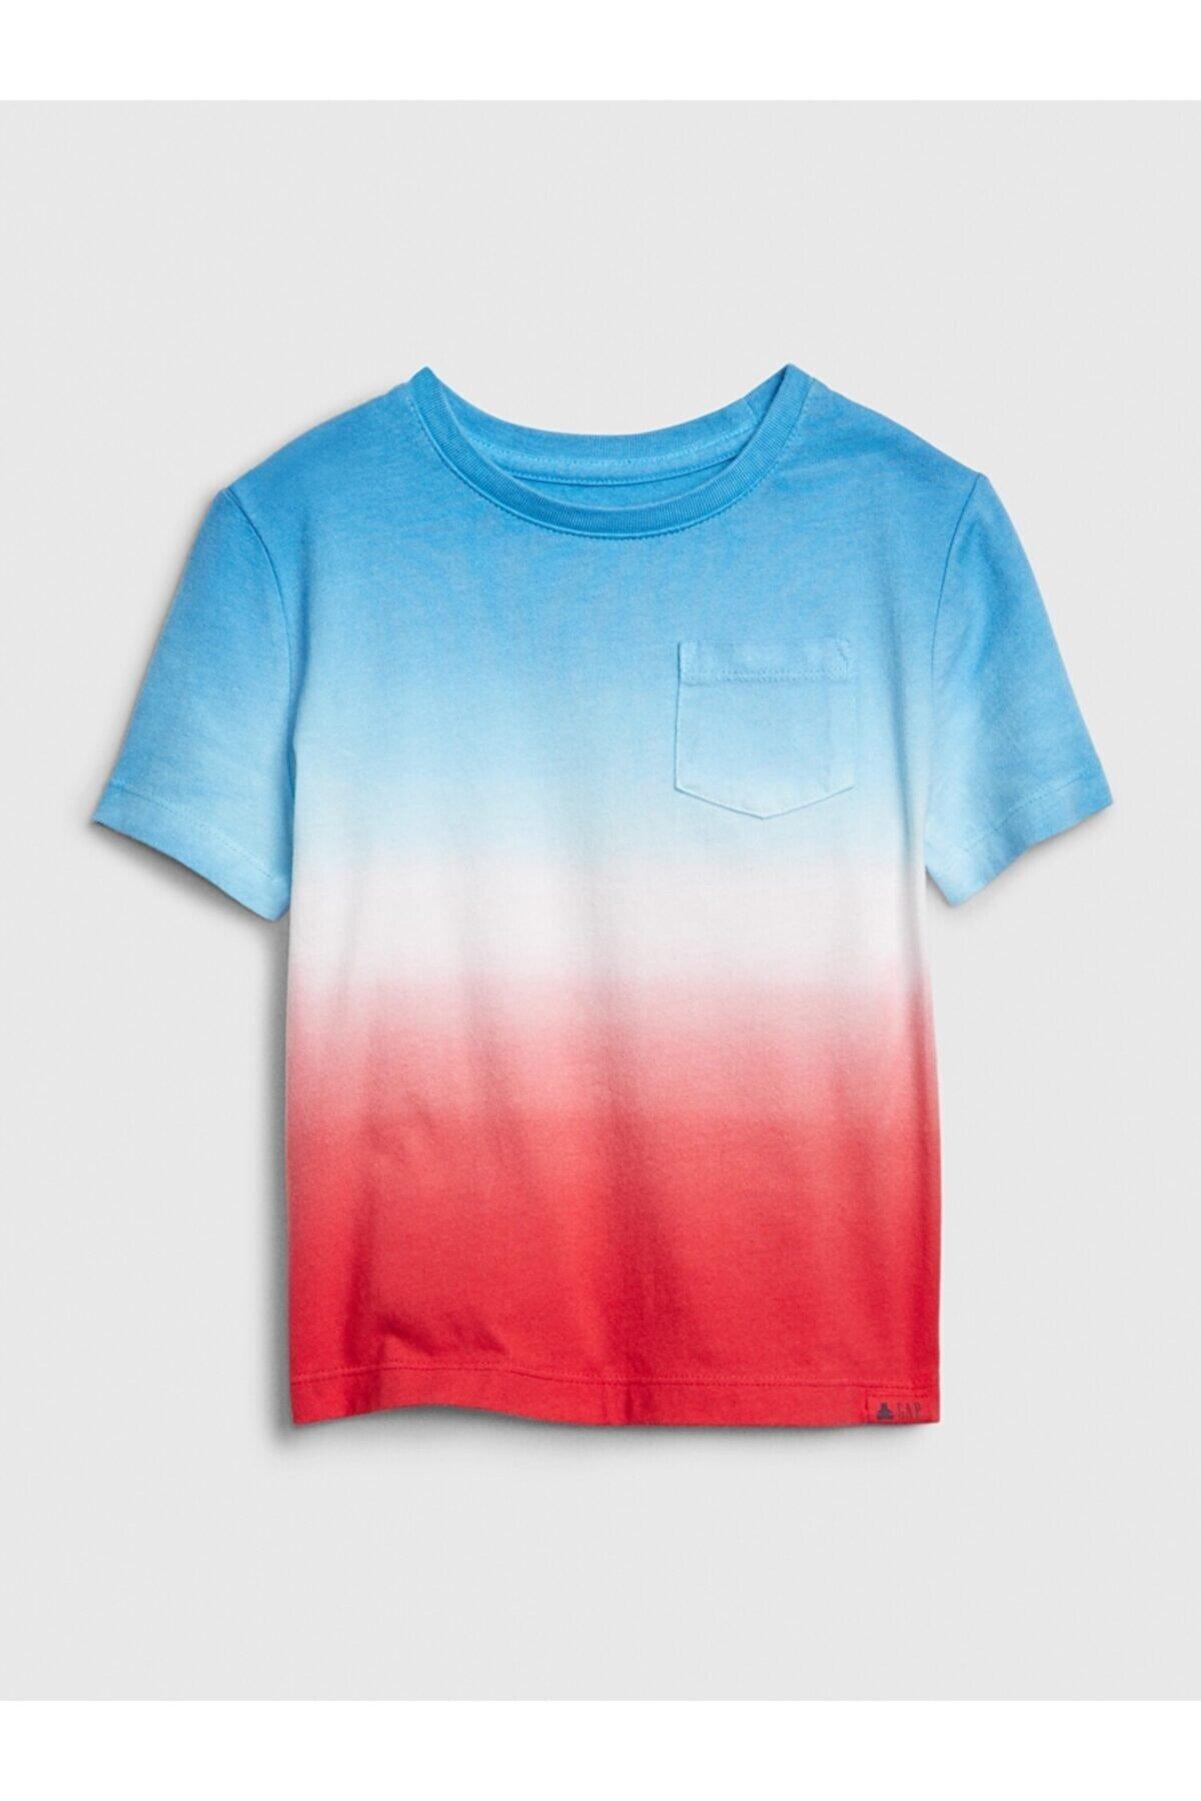 GAP Erkek Bebek Mavi Cepli Desenli T-shirt